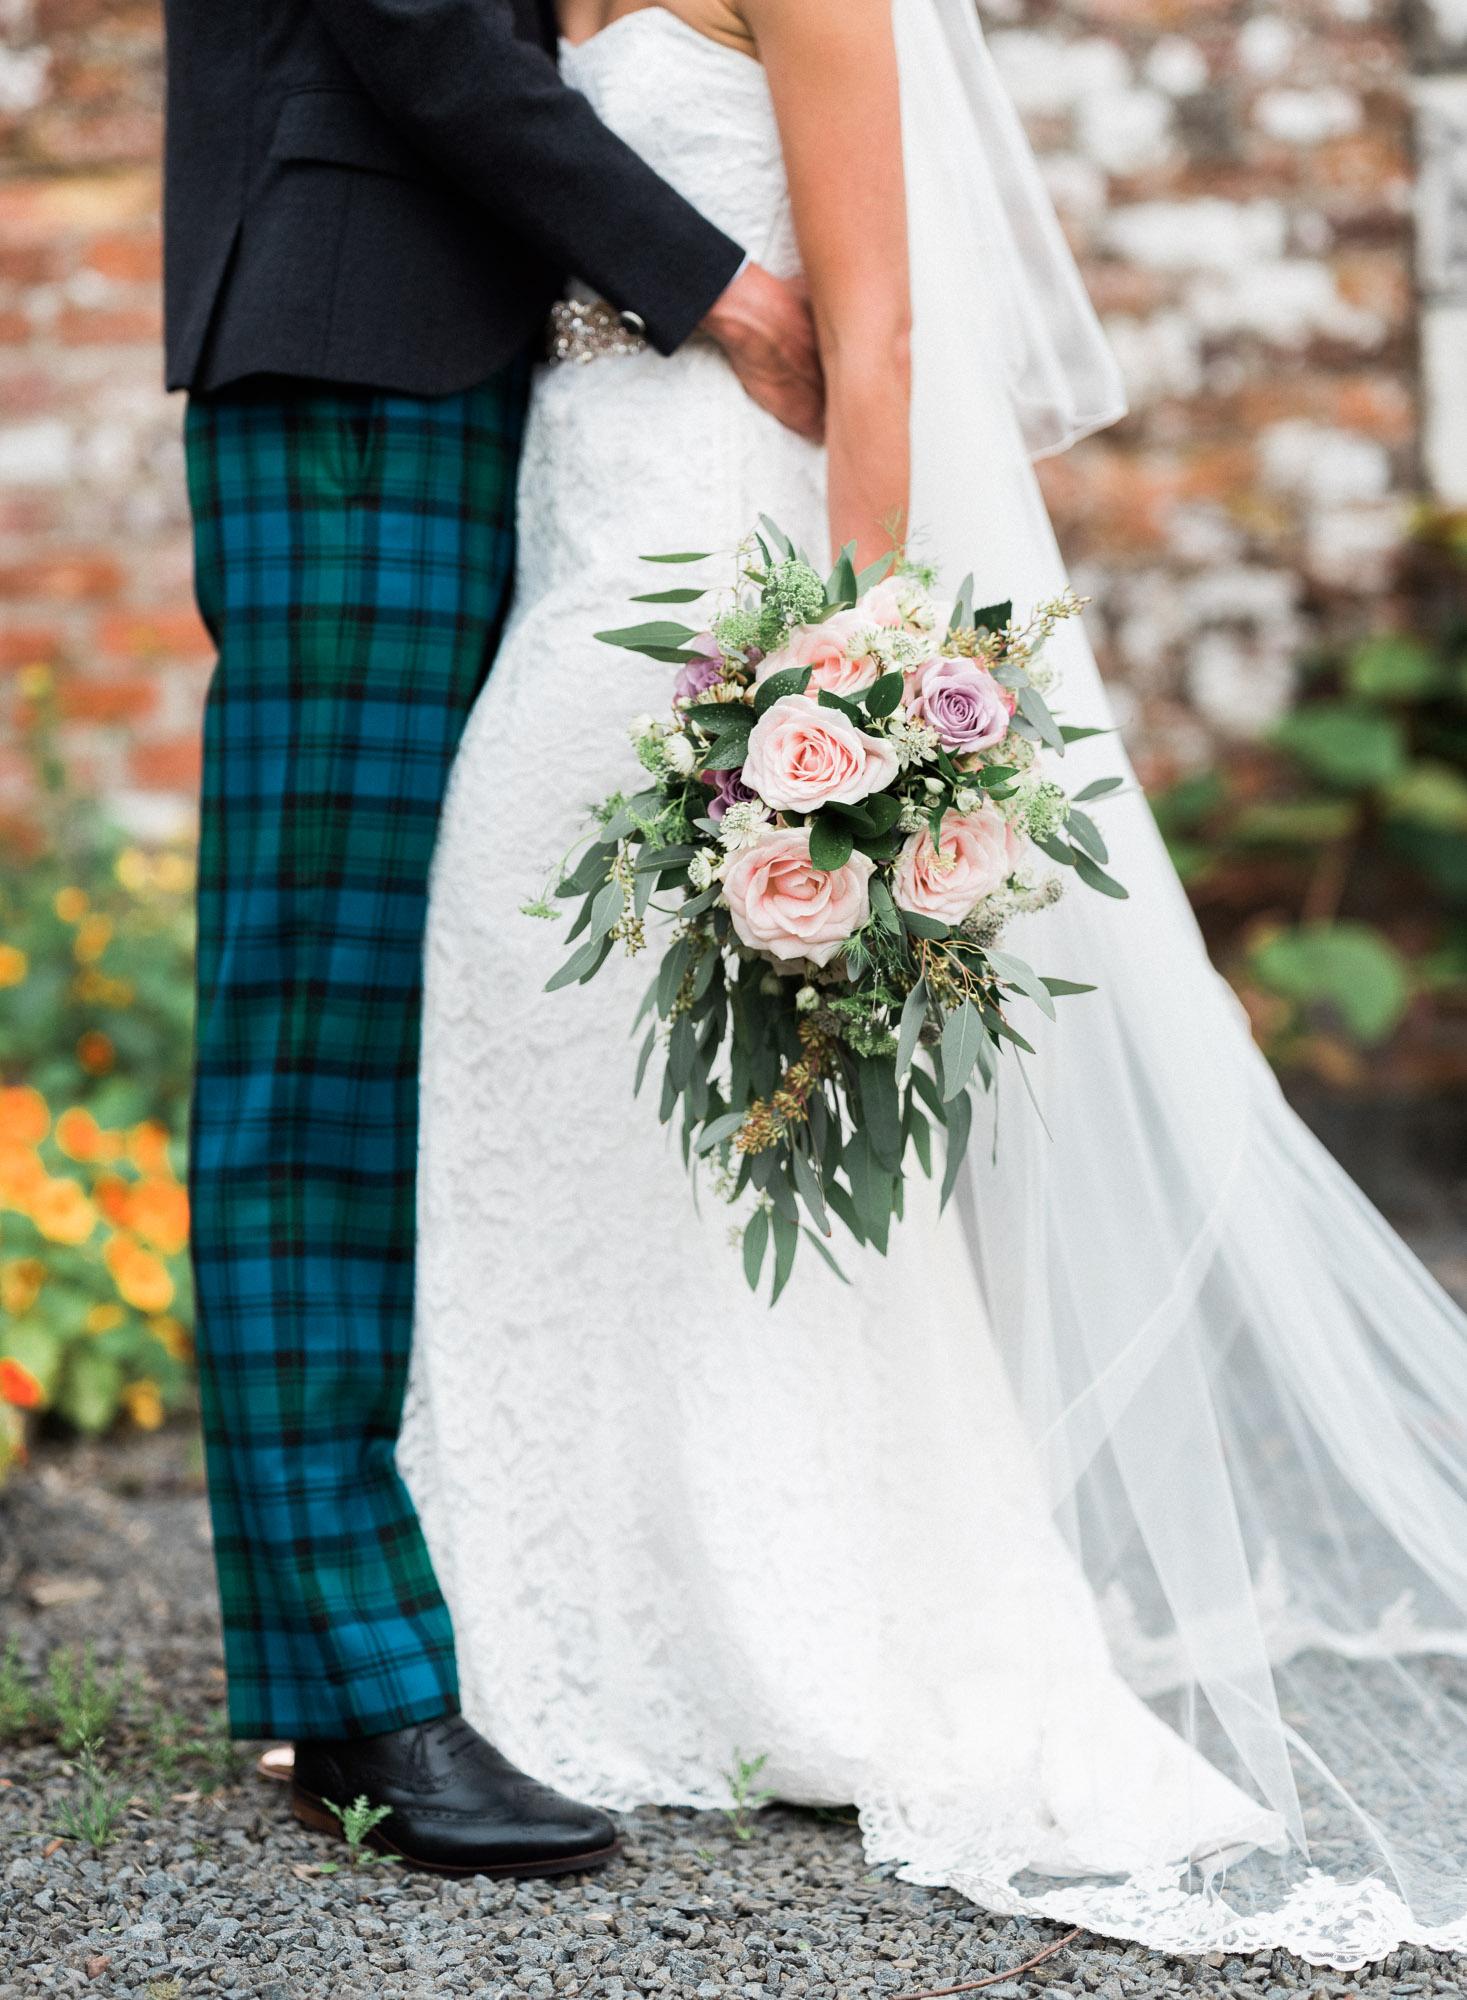 scottish_wedding_blairquhan_castle-49.jpg